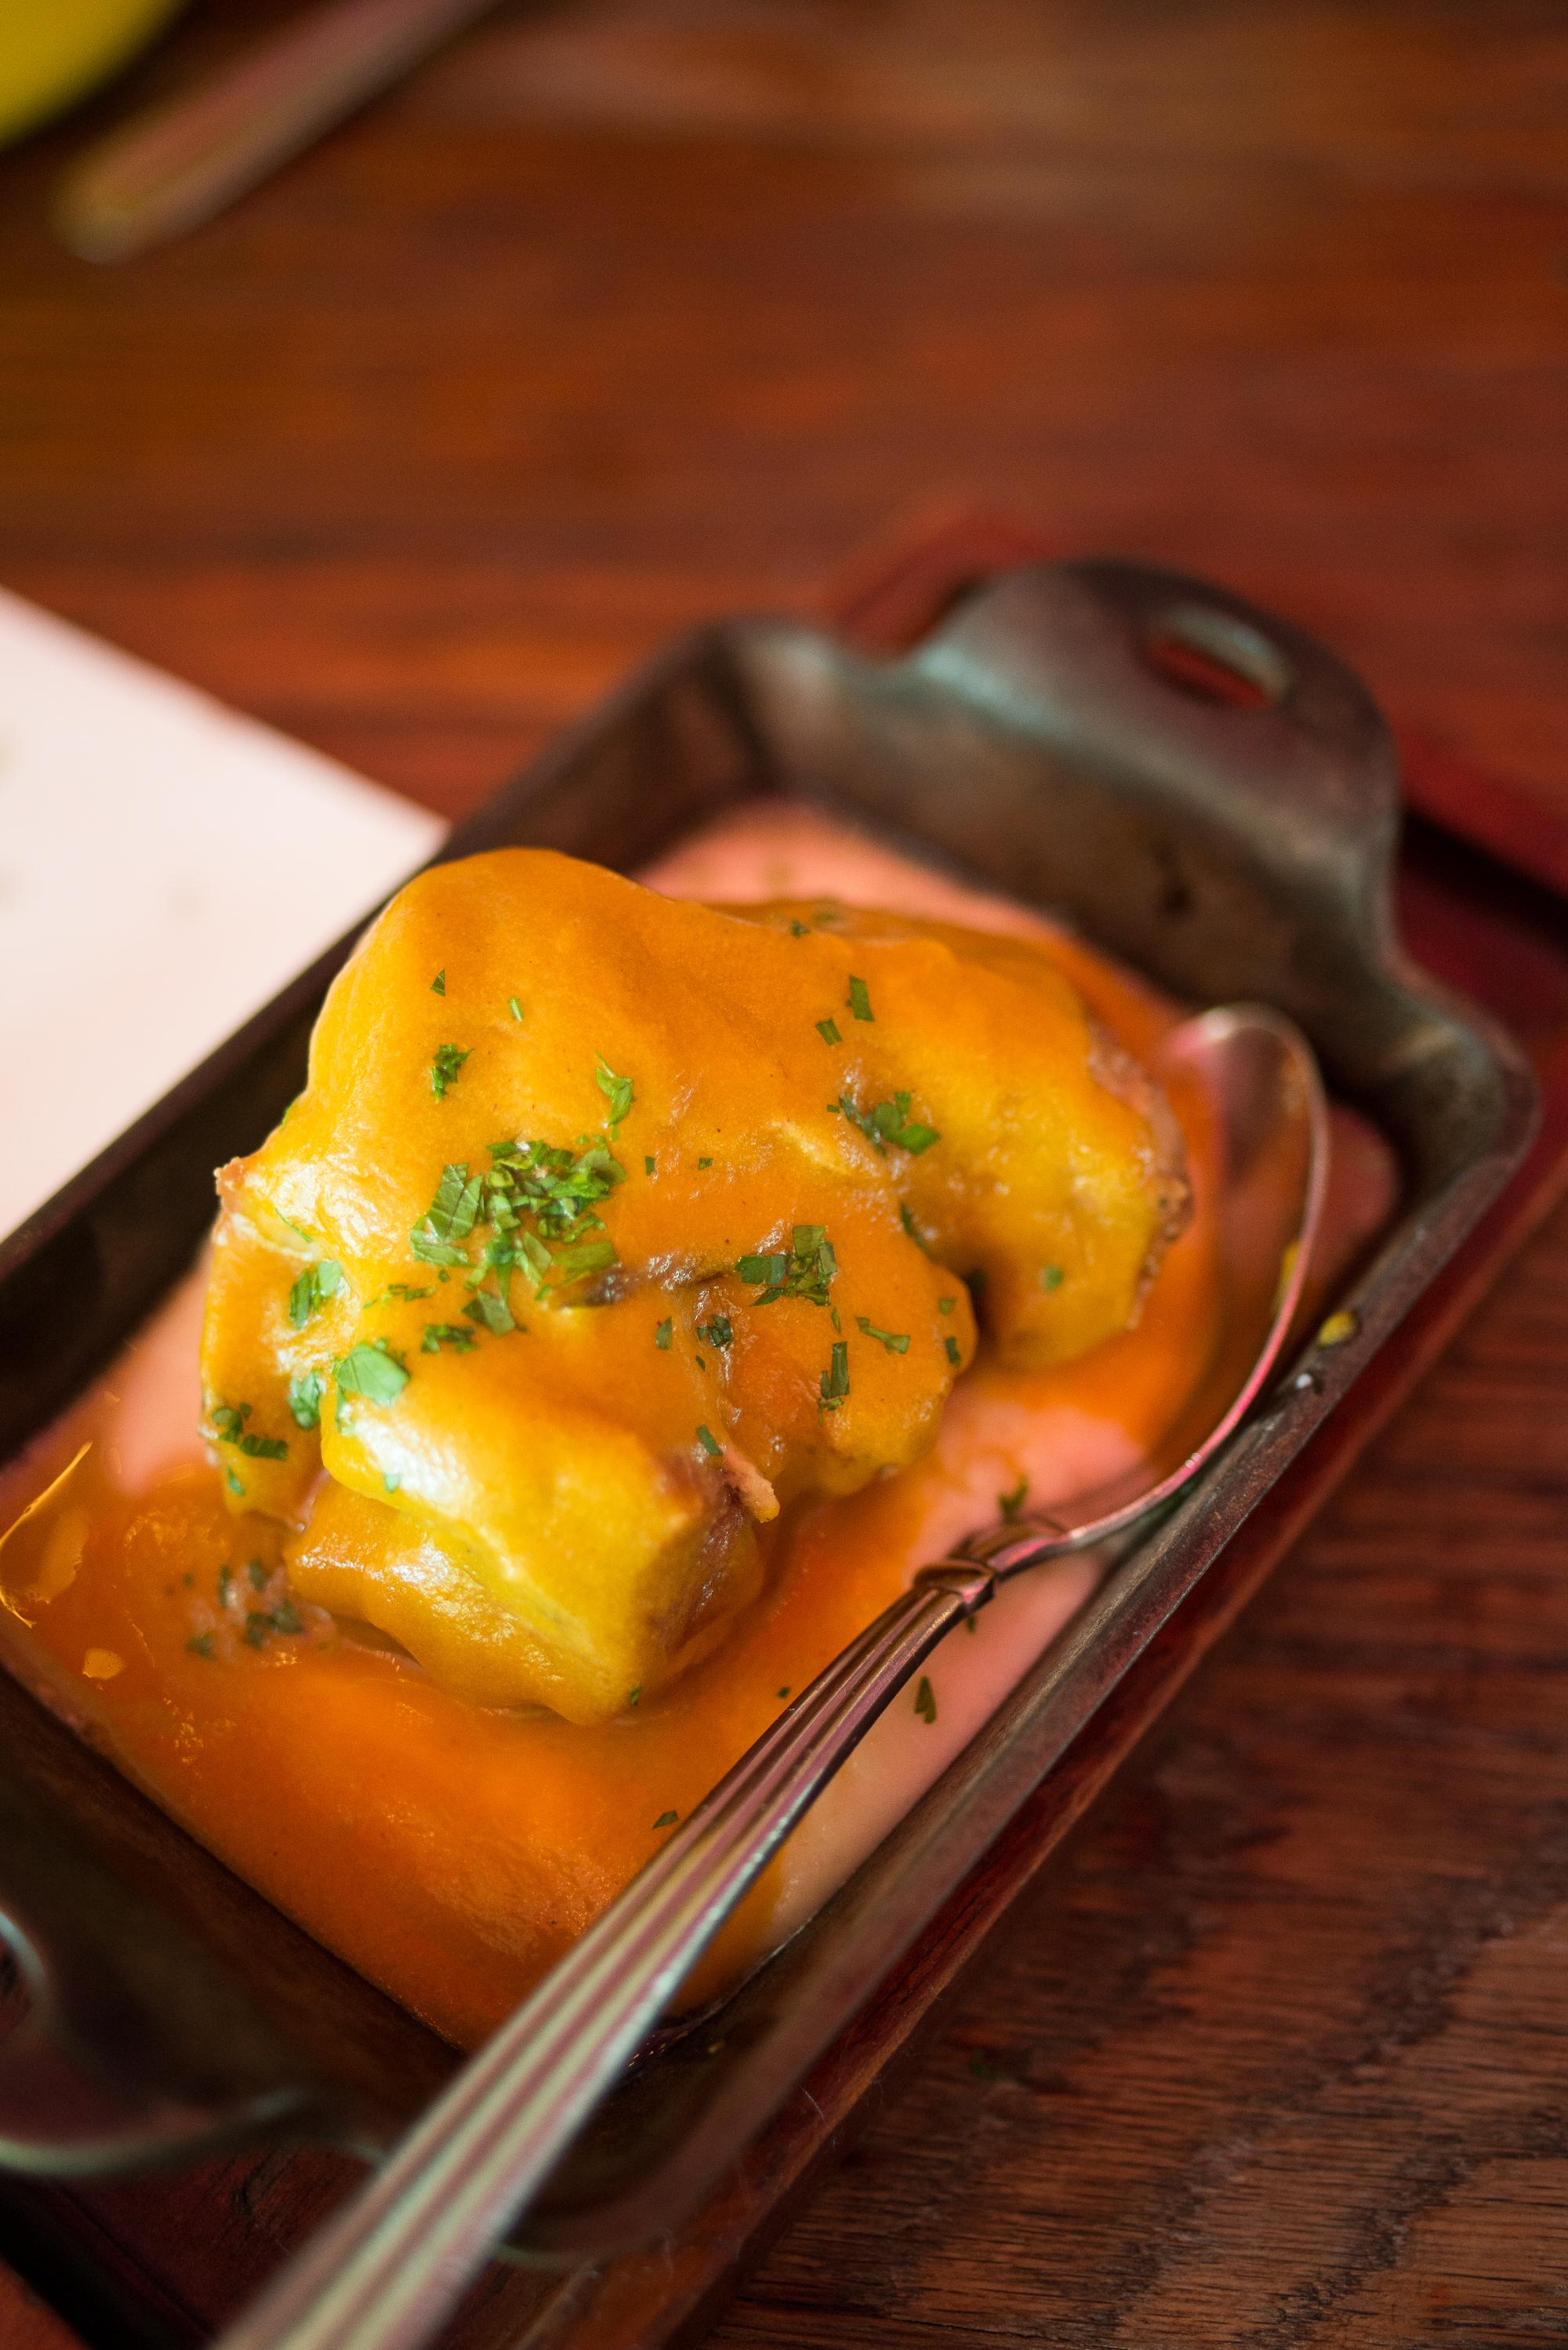 Milk Braised Pork Shoulder with Mashed Potatoes